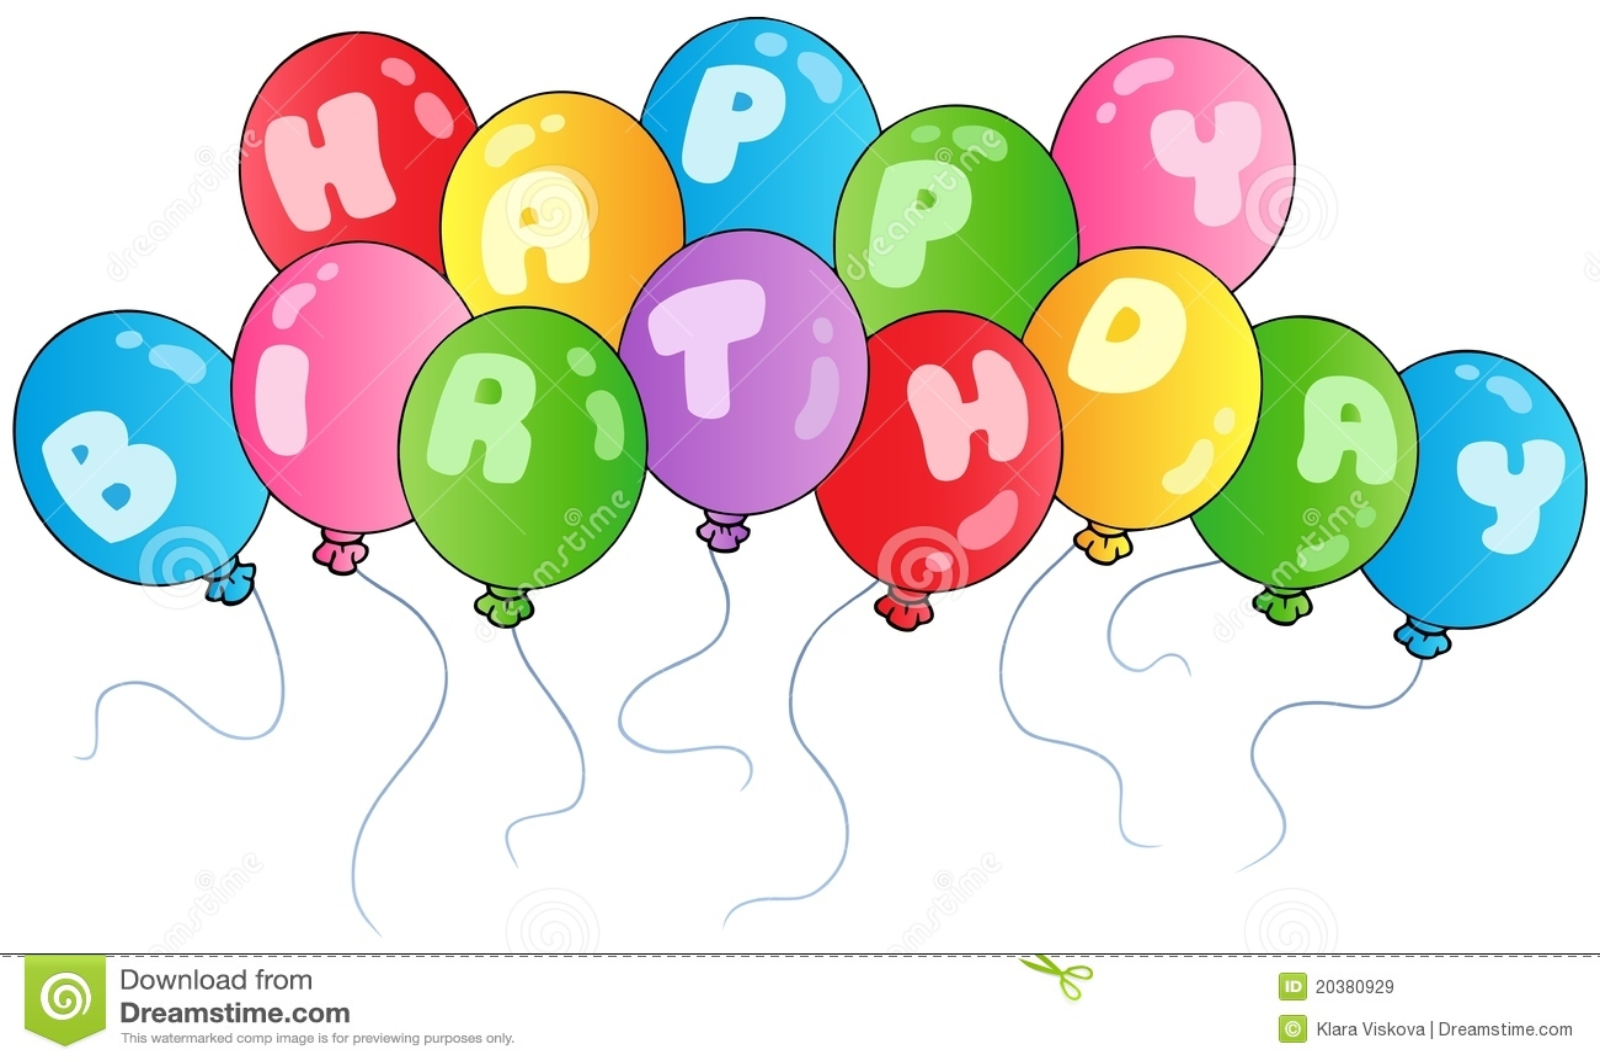 Happy birthday balloons stock vector illustration of - Globos de cumpleanos ...